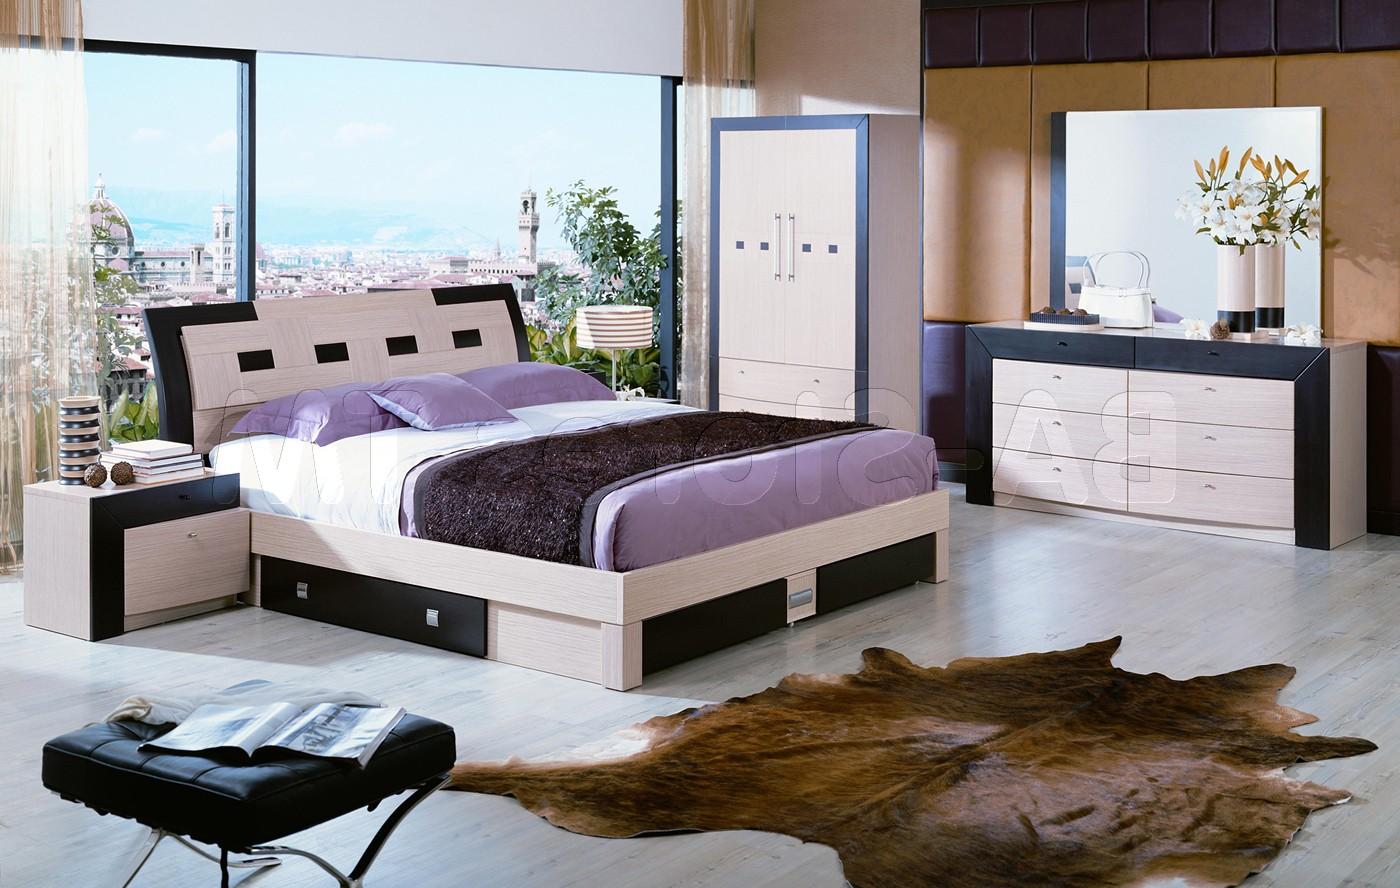 Ikea chambre a coucher ado chambre id es de d coration - Chambre a coucher ikea ...